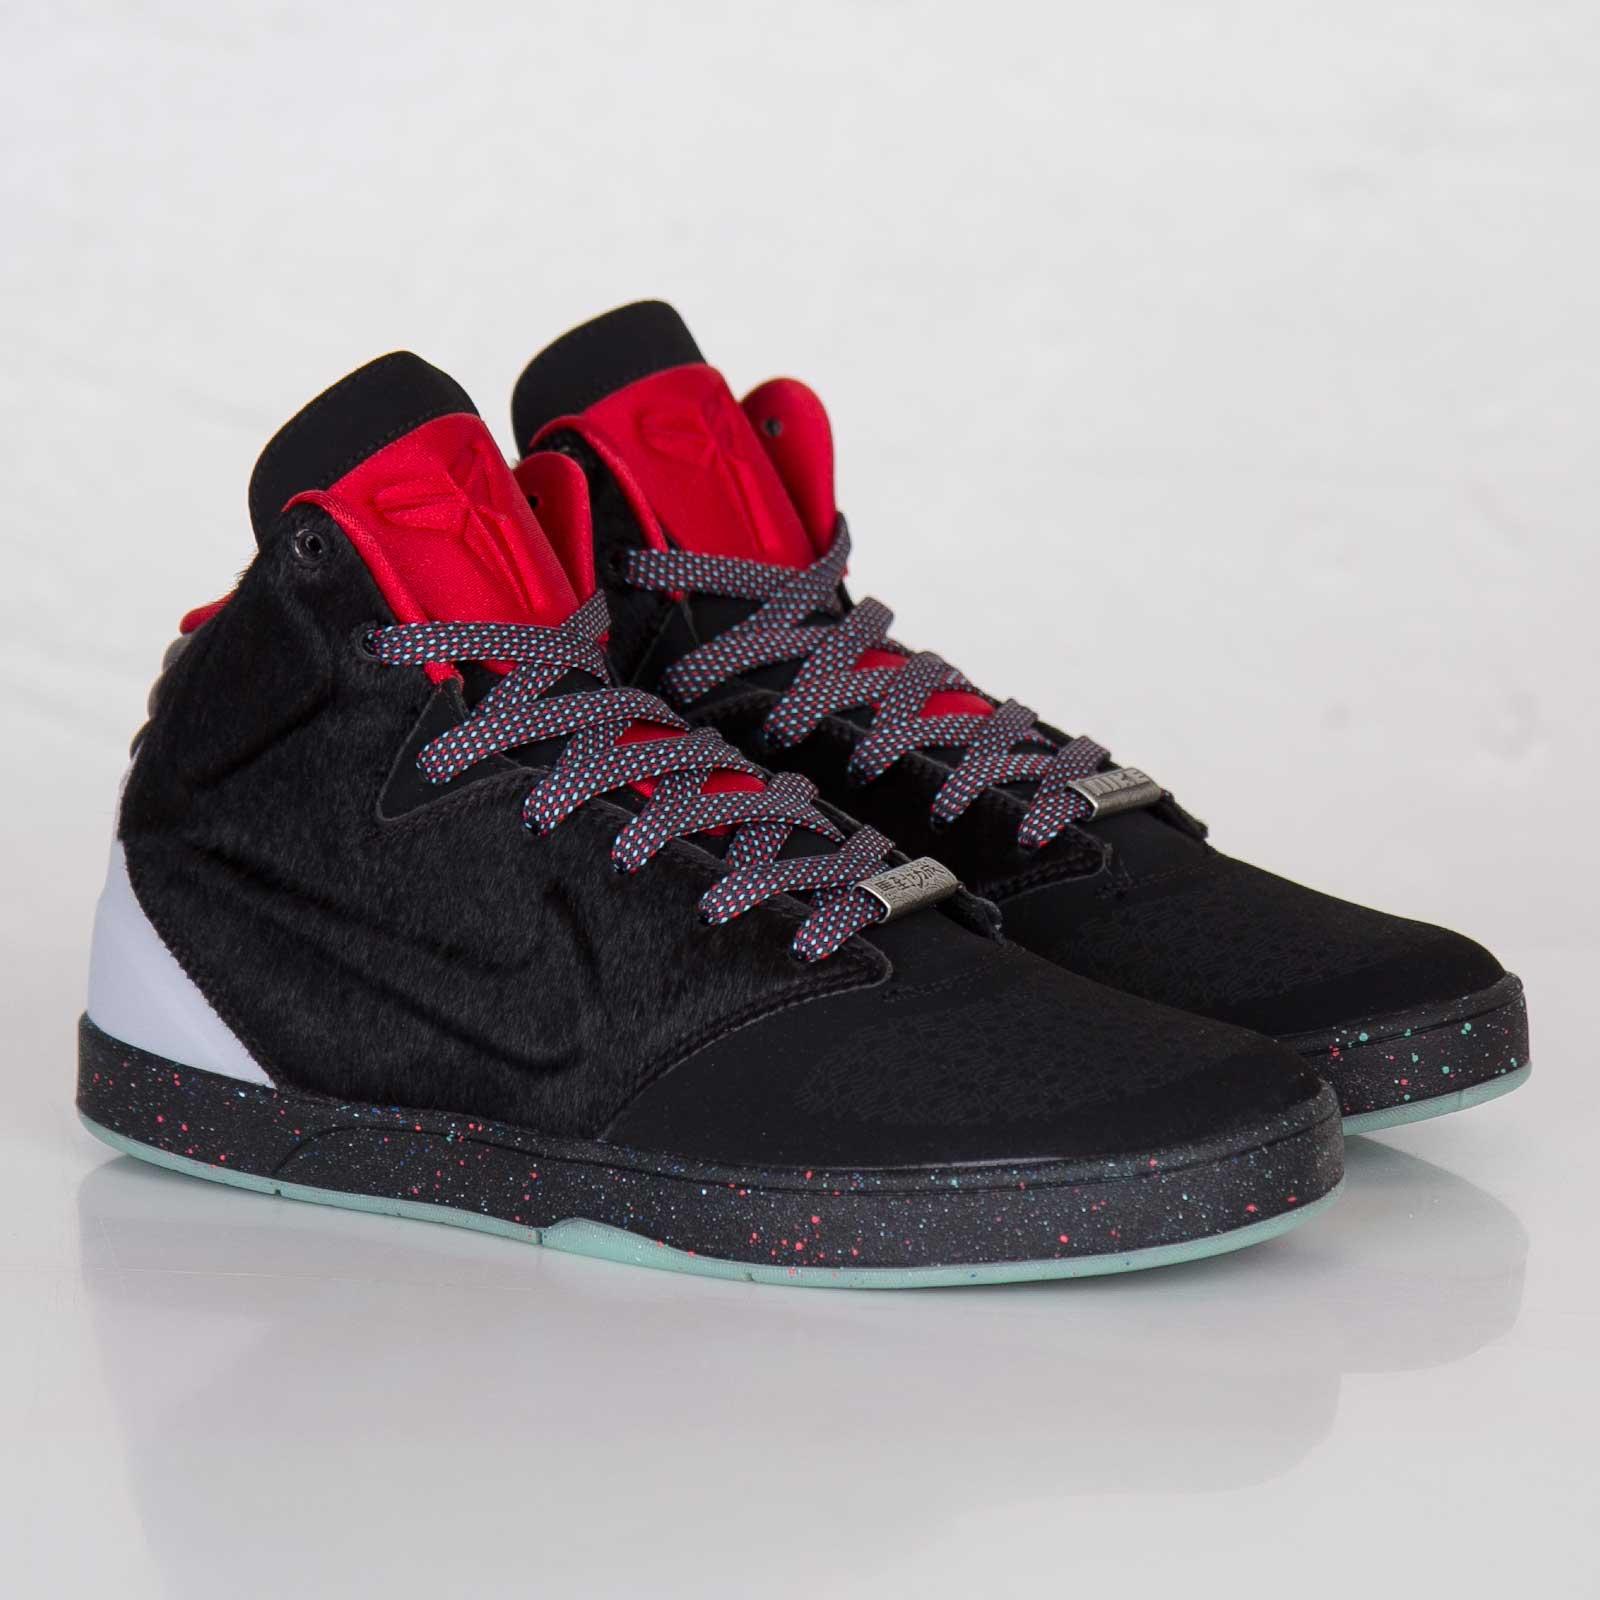 Nike Kobe 9 NSW Lifestyle YOH QS